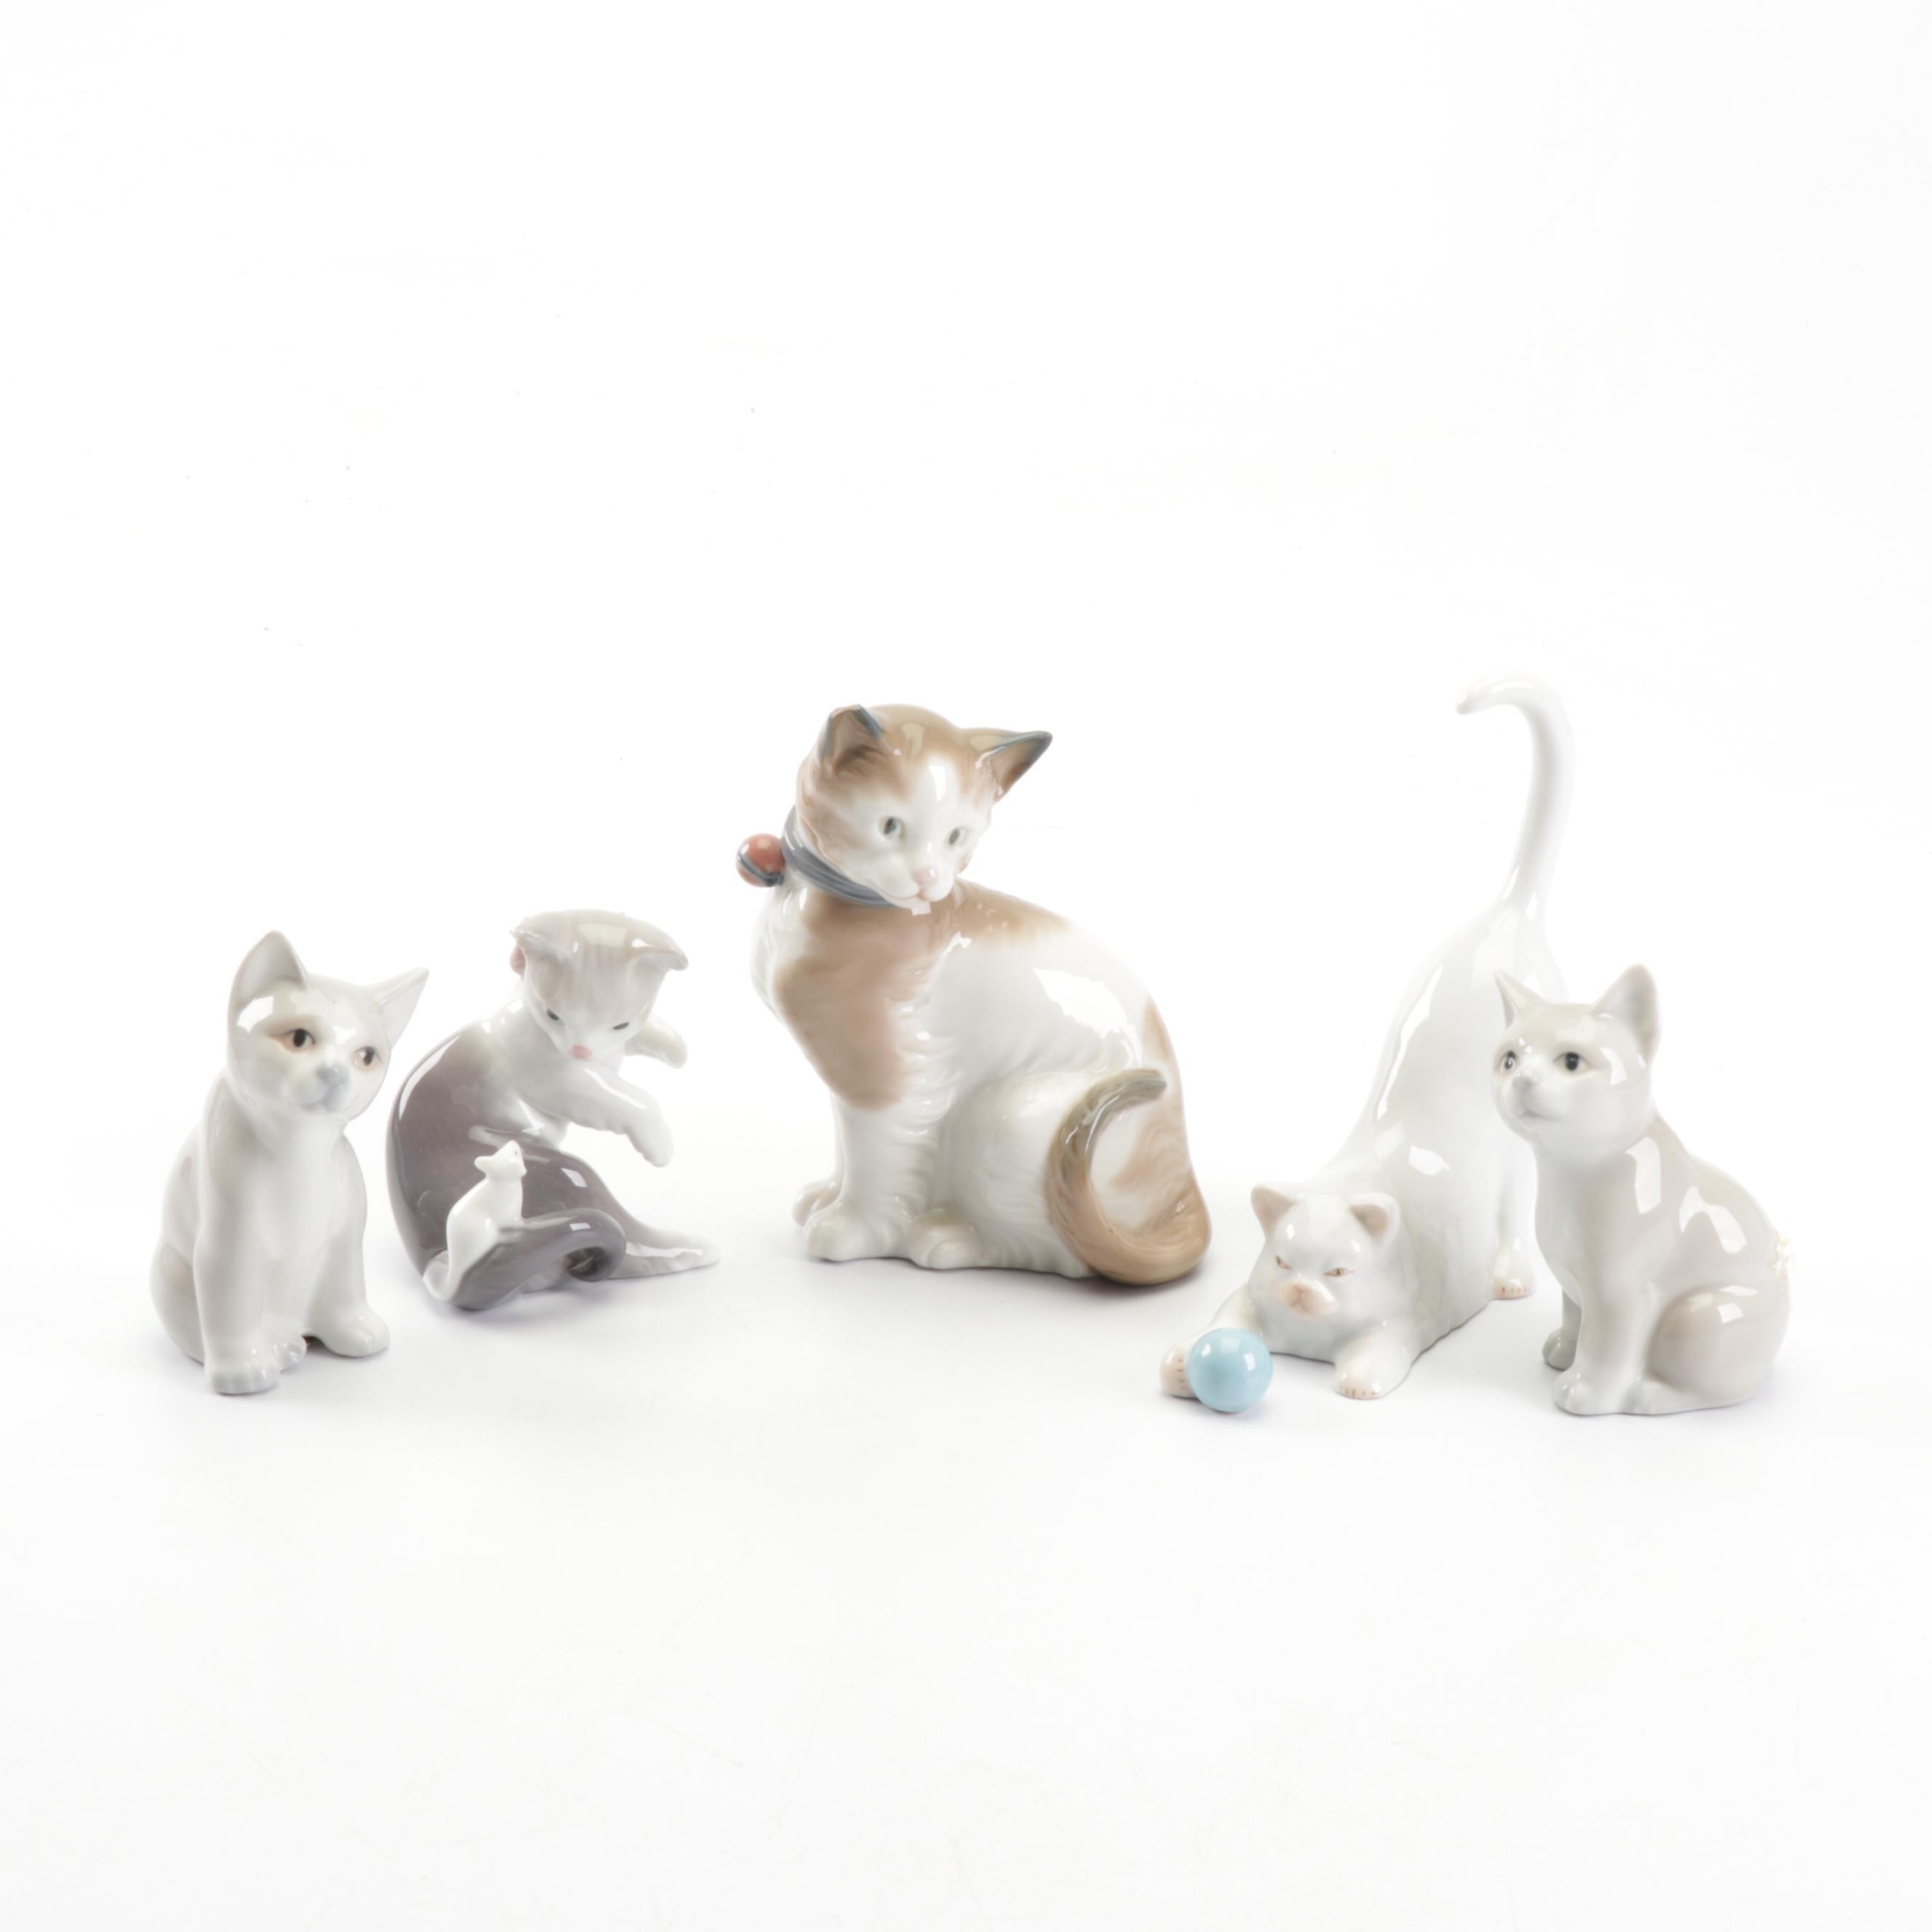 Porcelain Cat Figurines Including Lladró and Herend